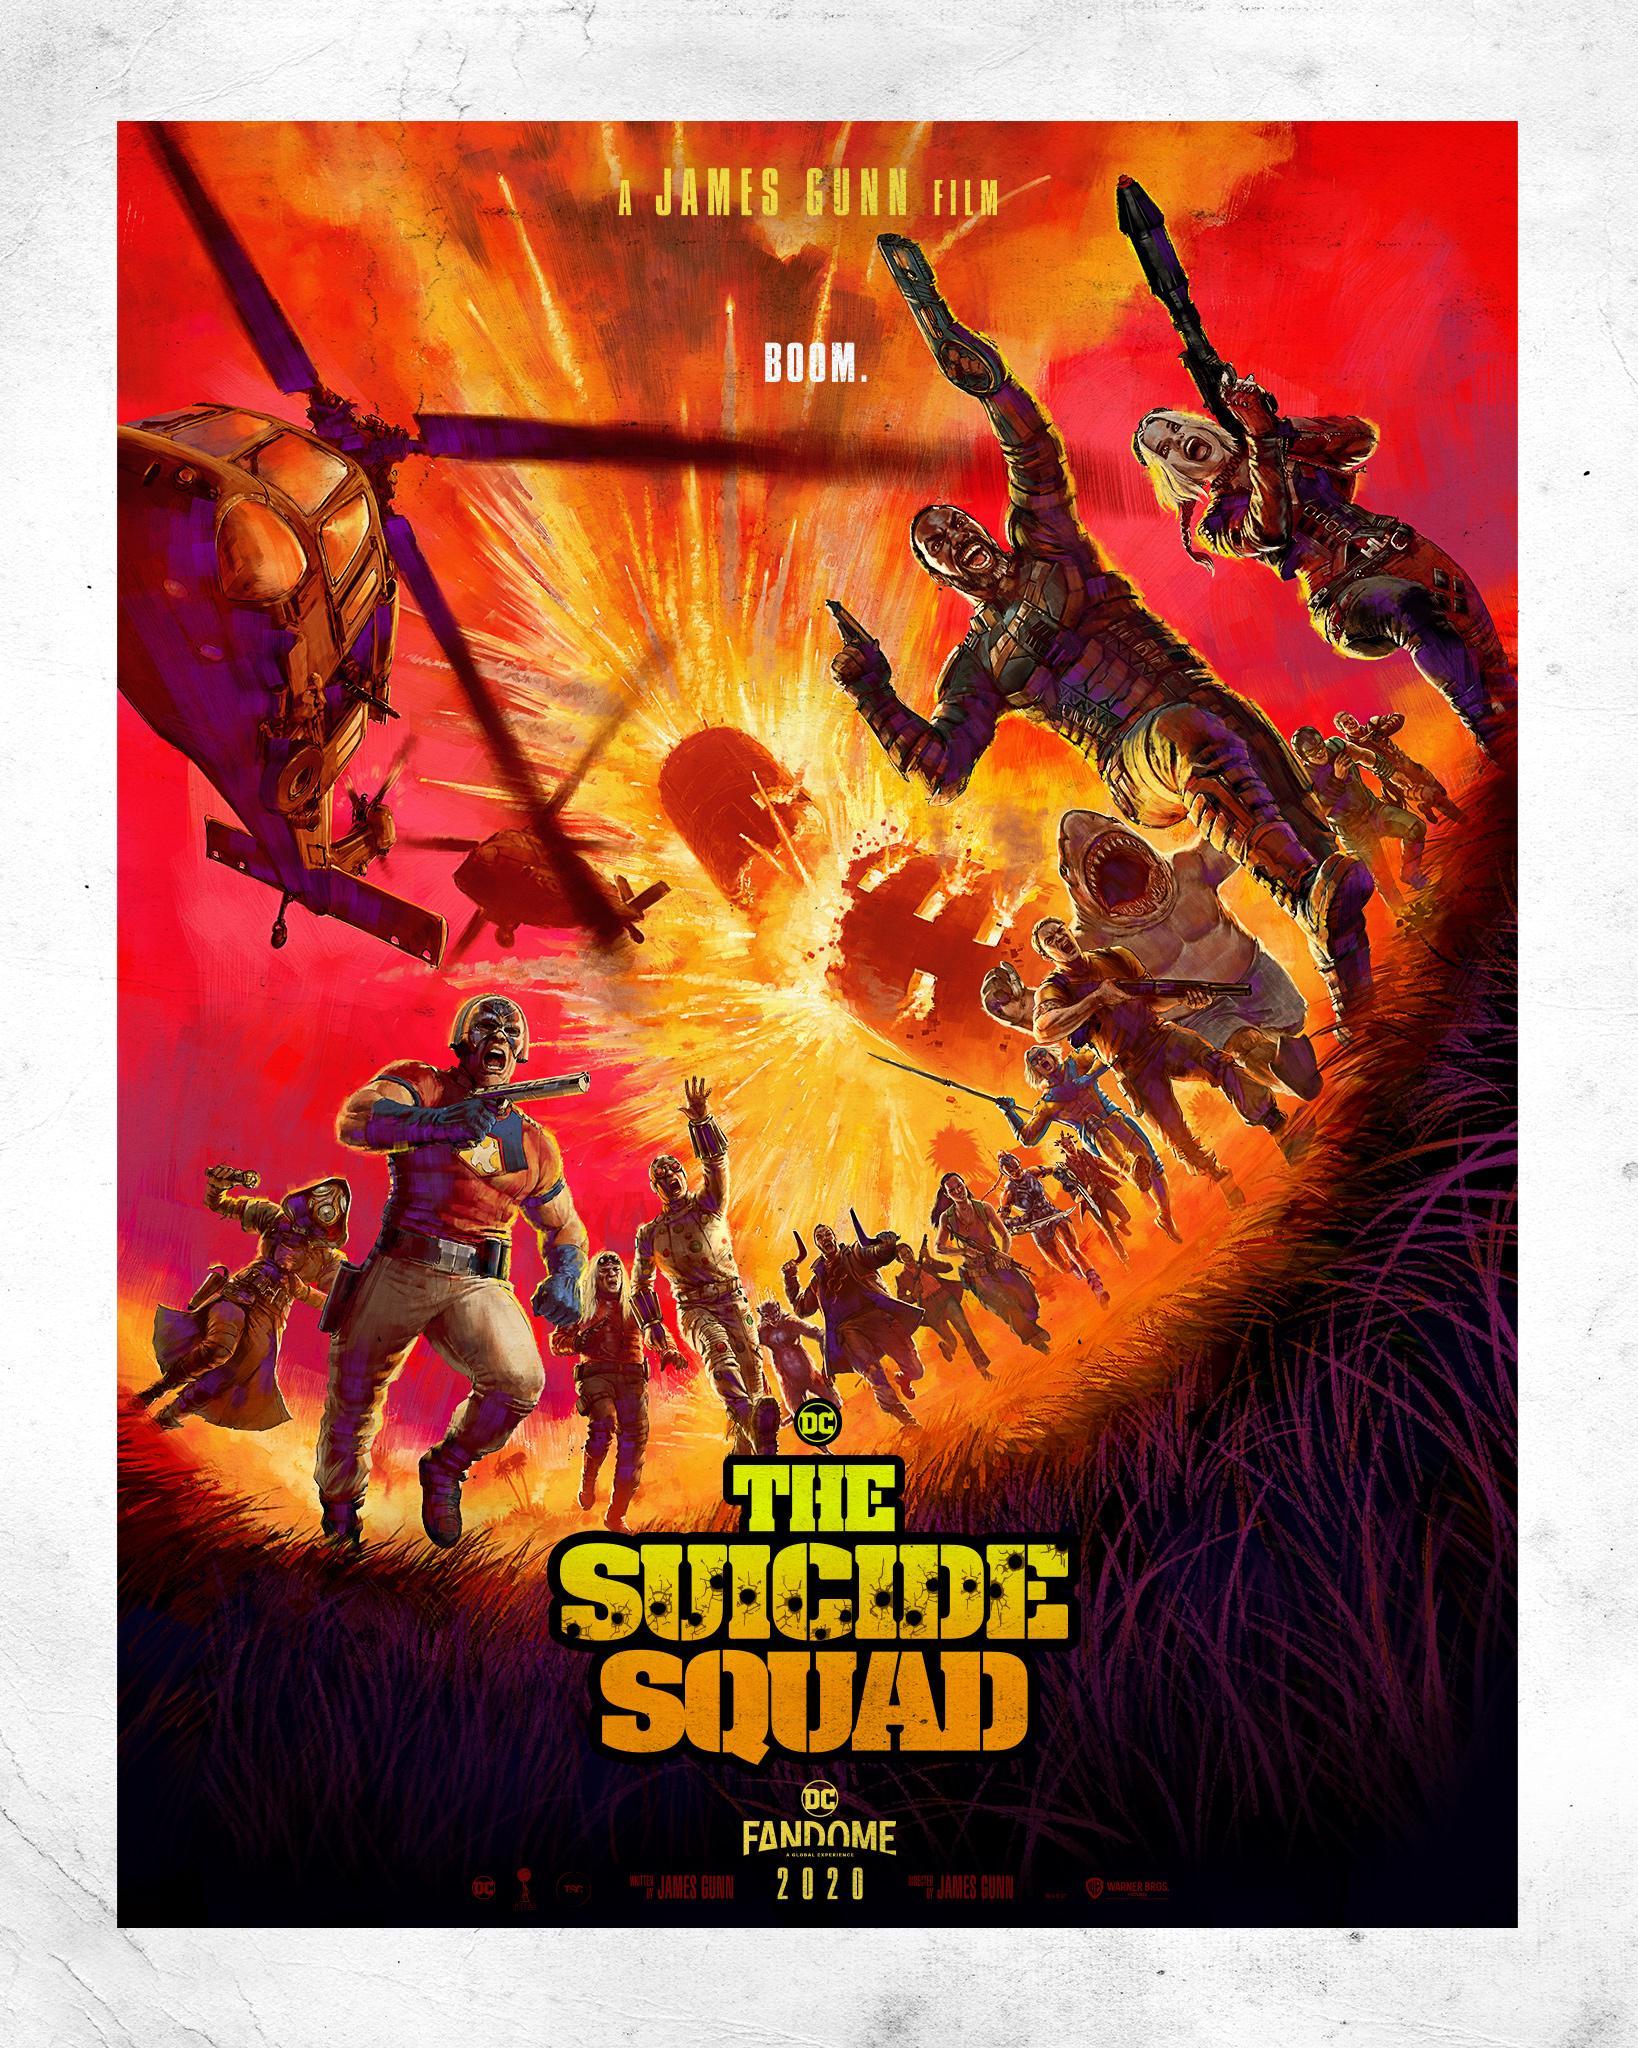 The Suicide Squad DC FanDome poster